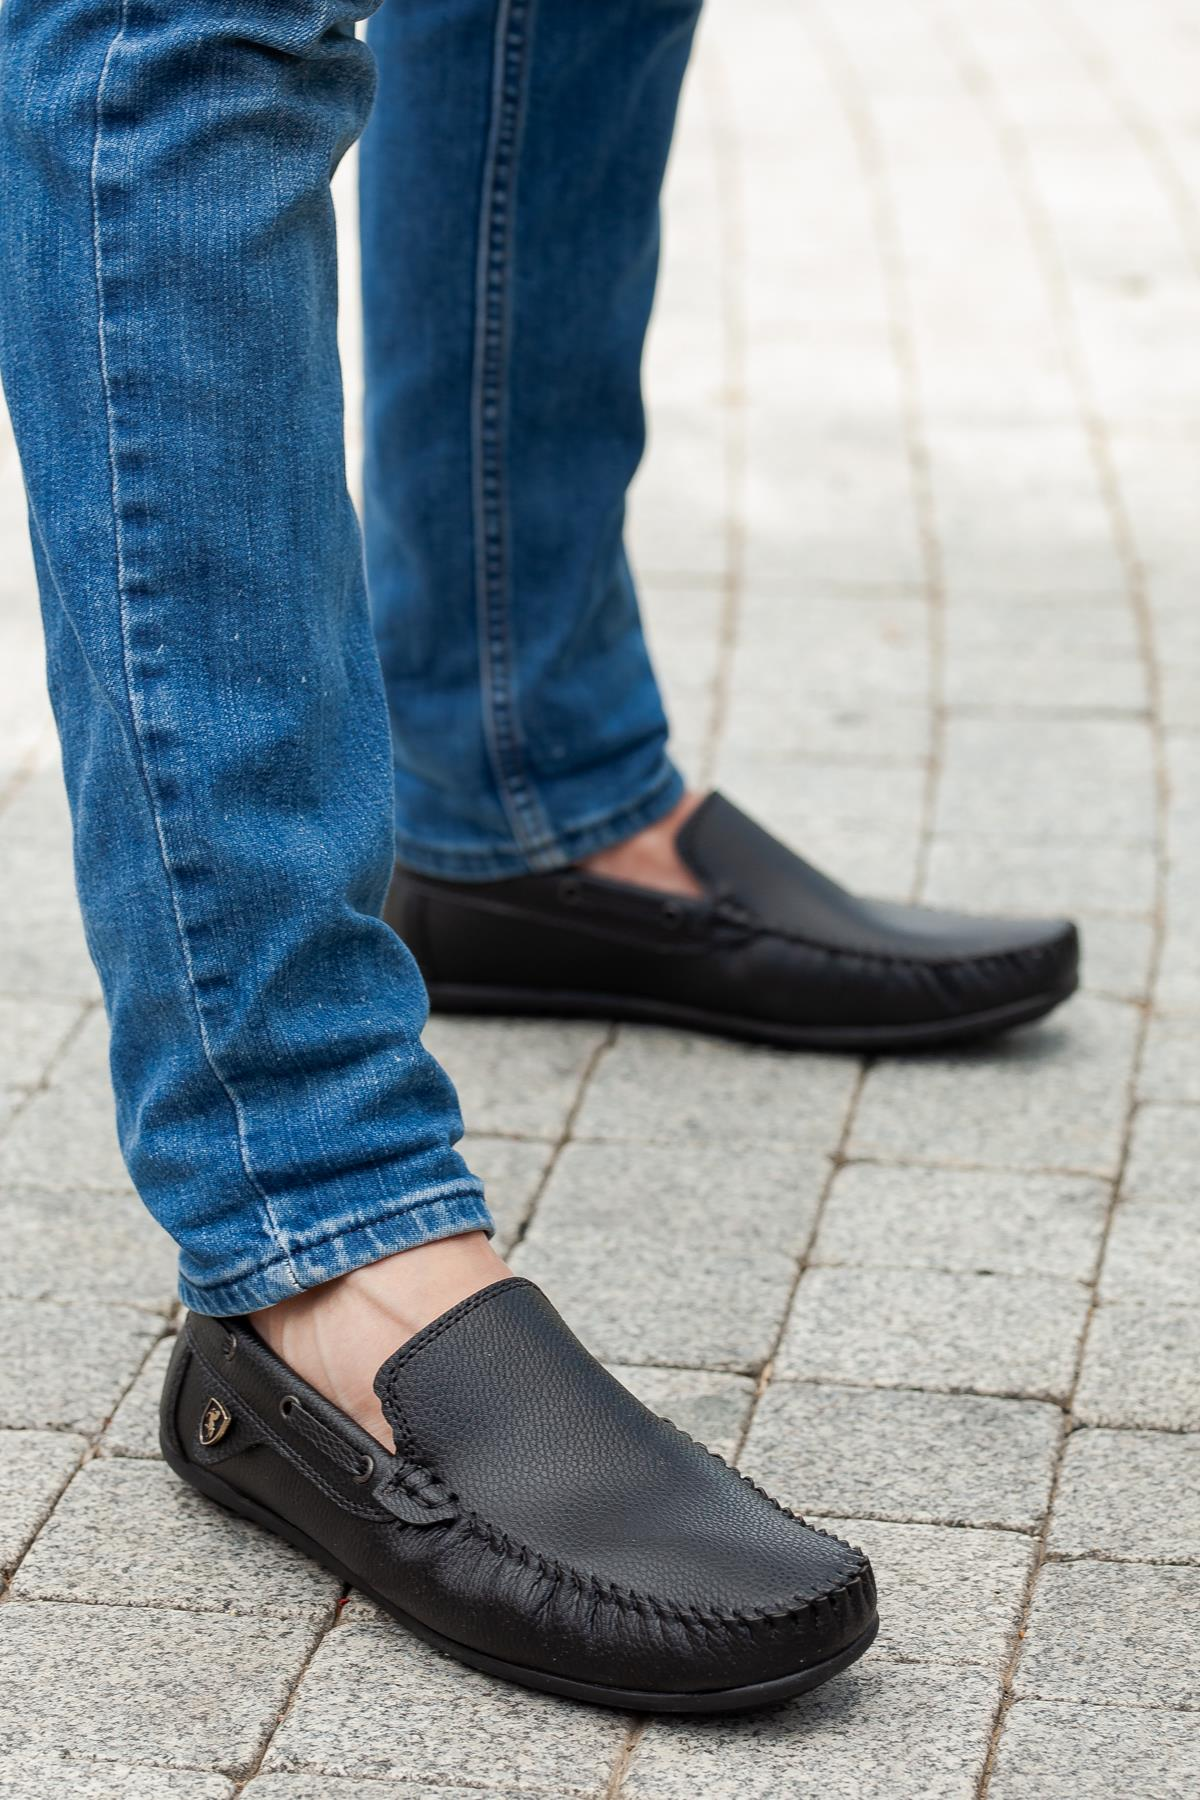 Men's Black Orthopedic Shoes